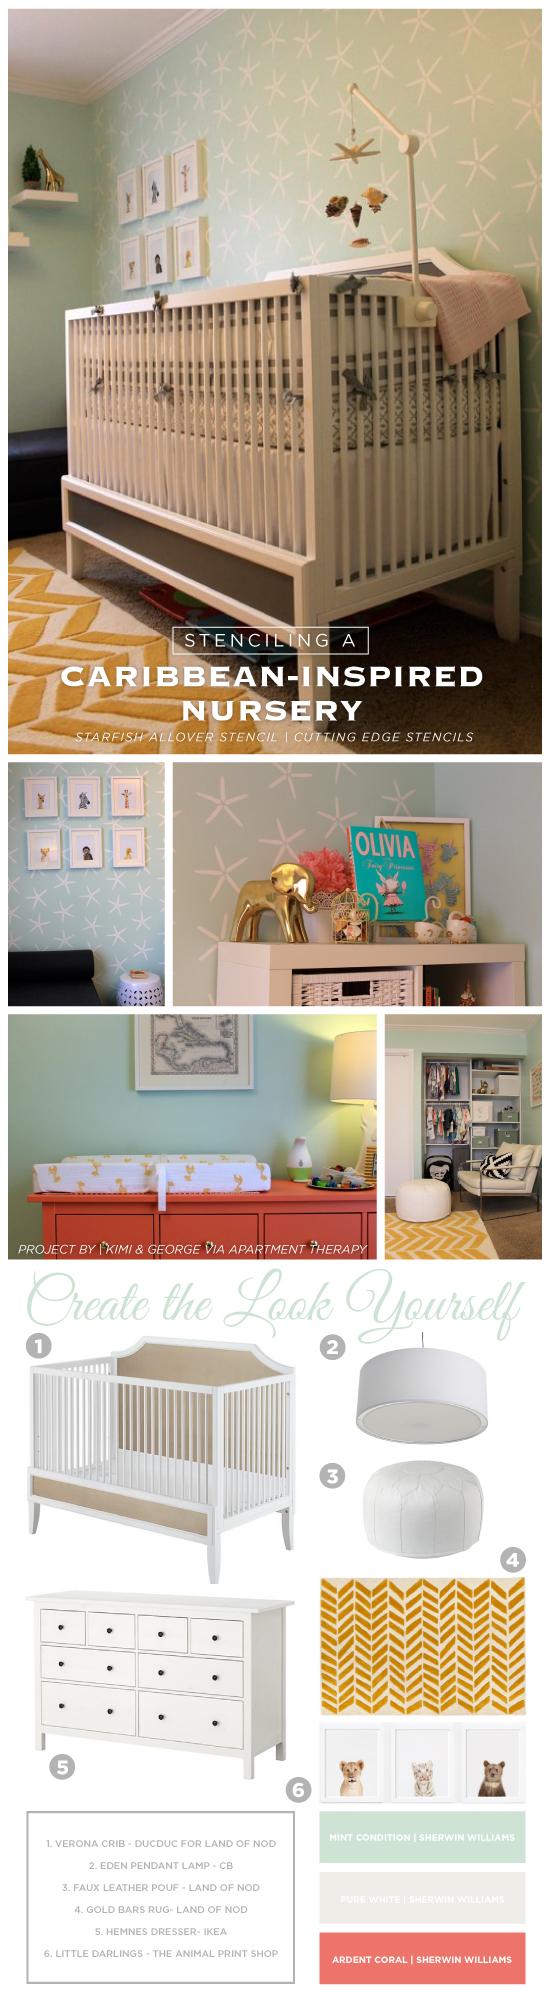 Steal the Look: A DIY Nursery design idea using the Starfish Allover Stencil. http://www.cuttingedgestencils.com/starfish-stencil-beach-style-decor.html